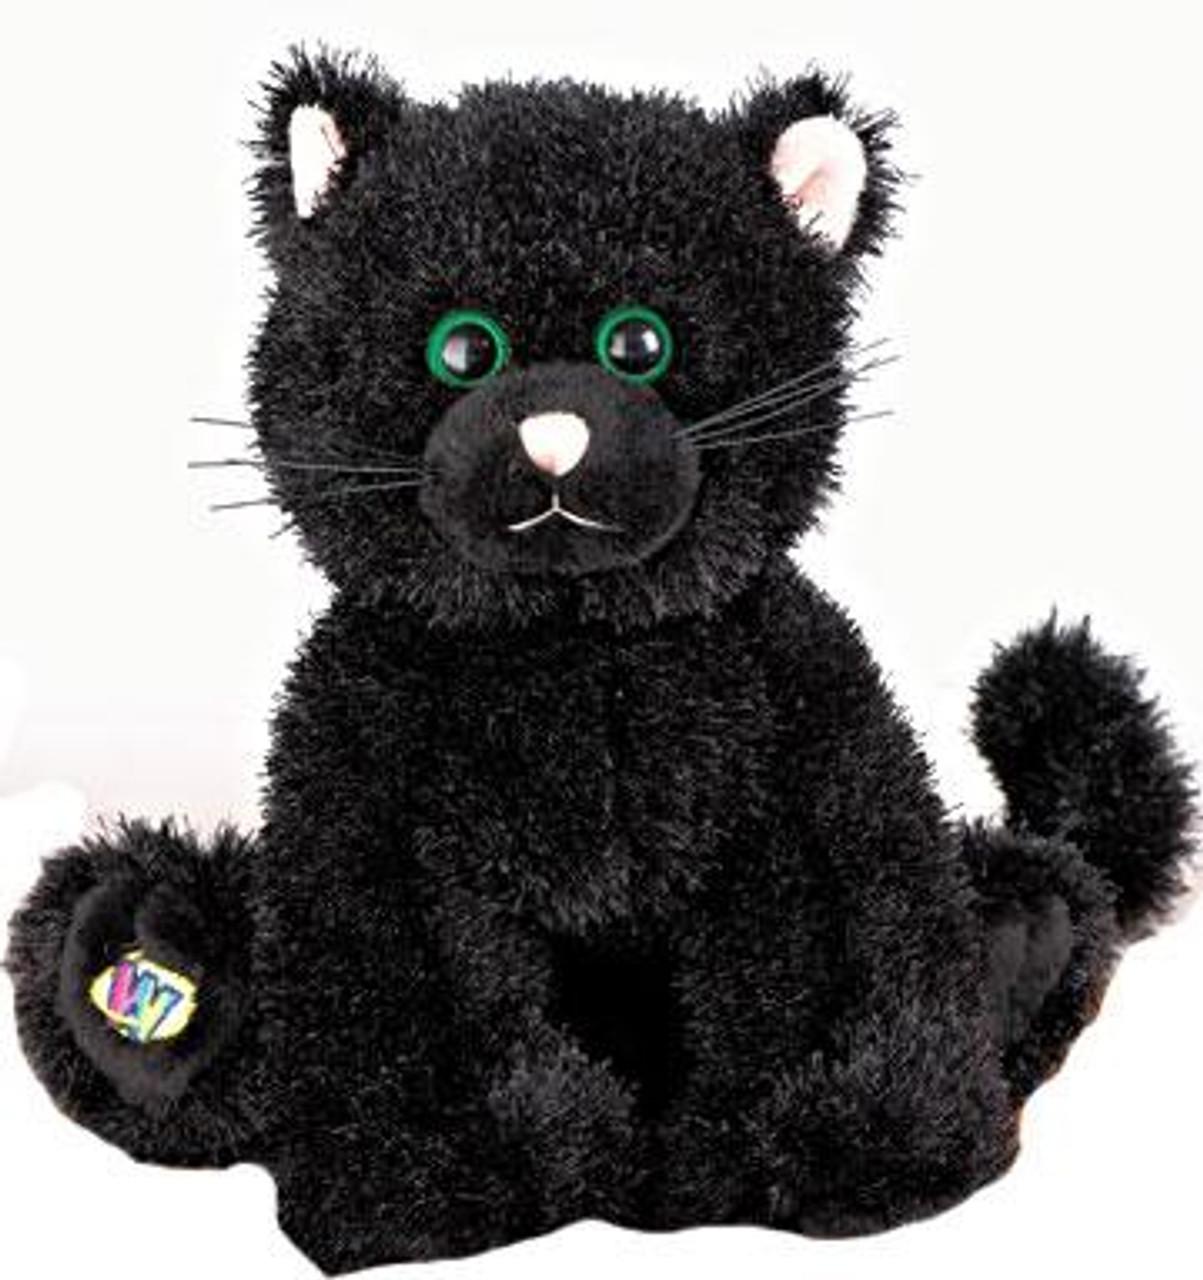 Webkinz Black Cat Plush